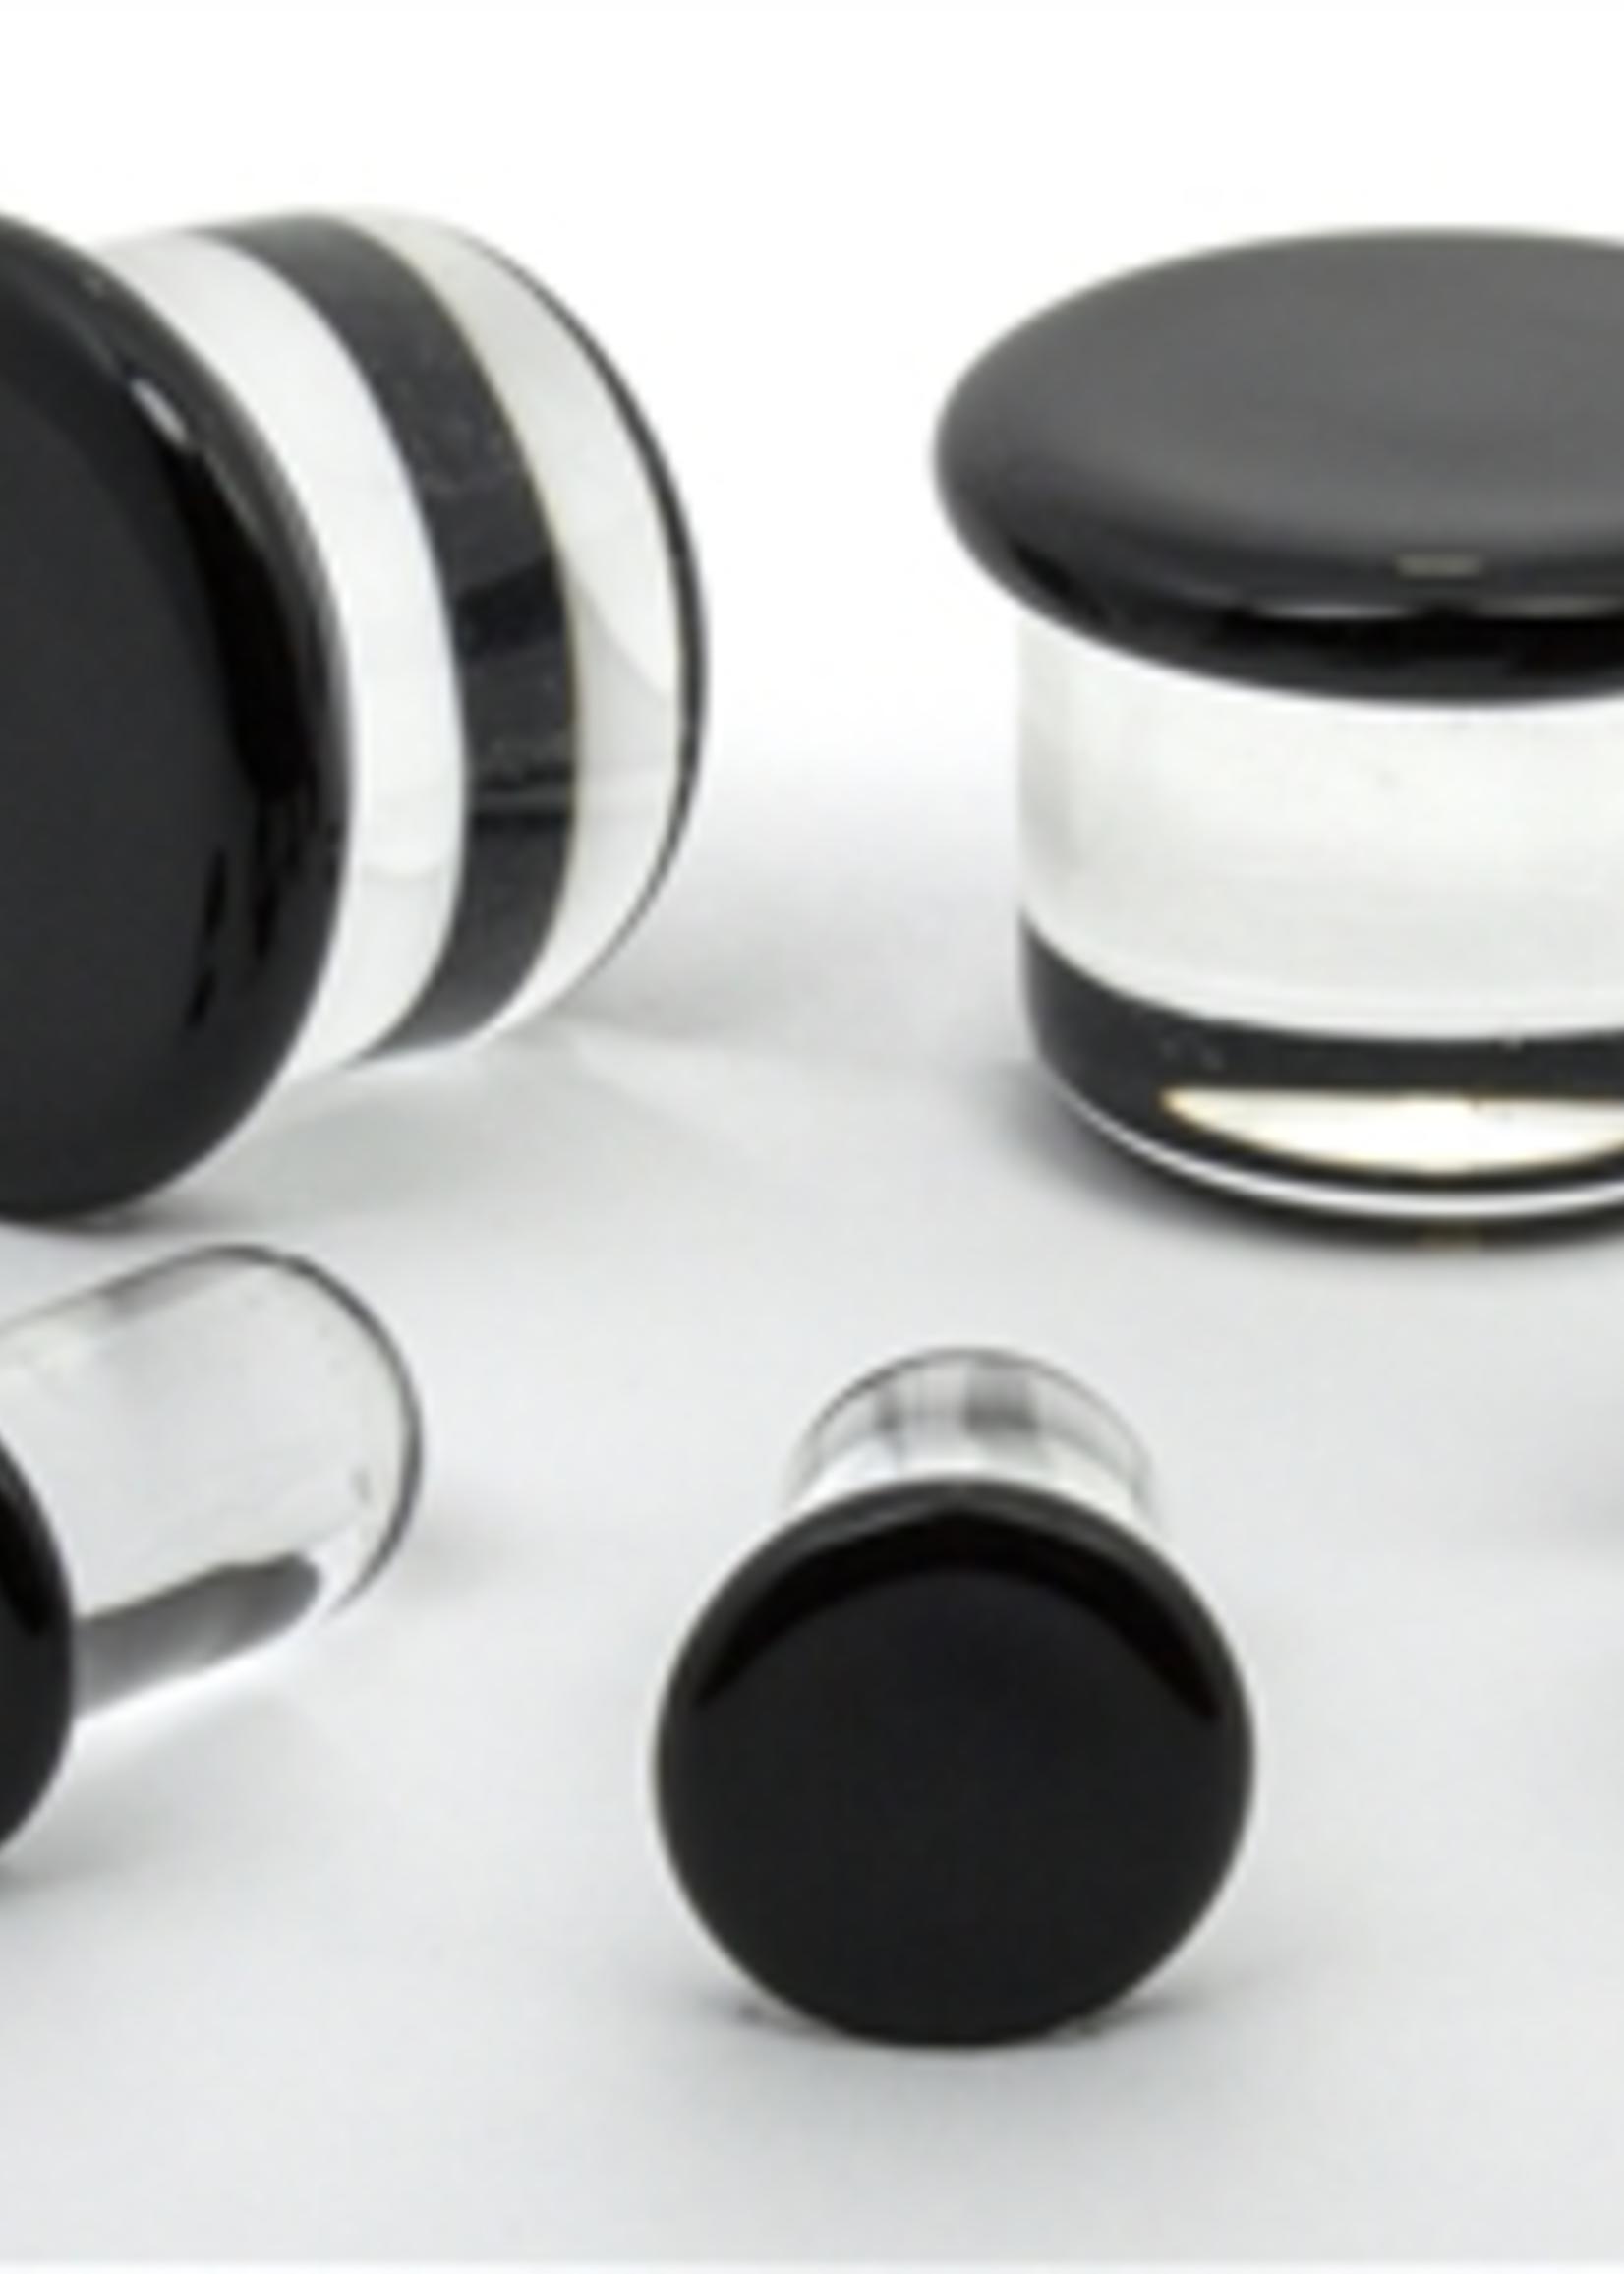 17mm SF Glass Plugs